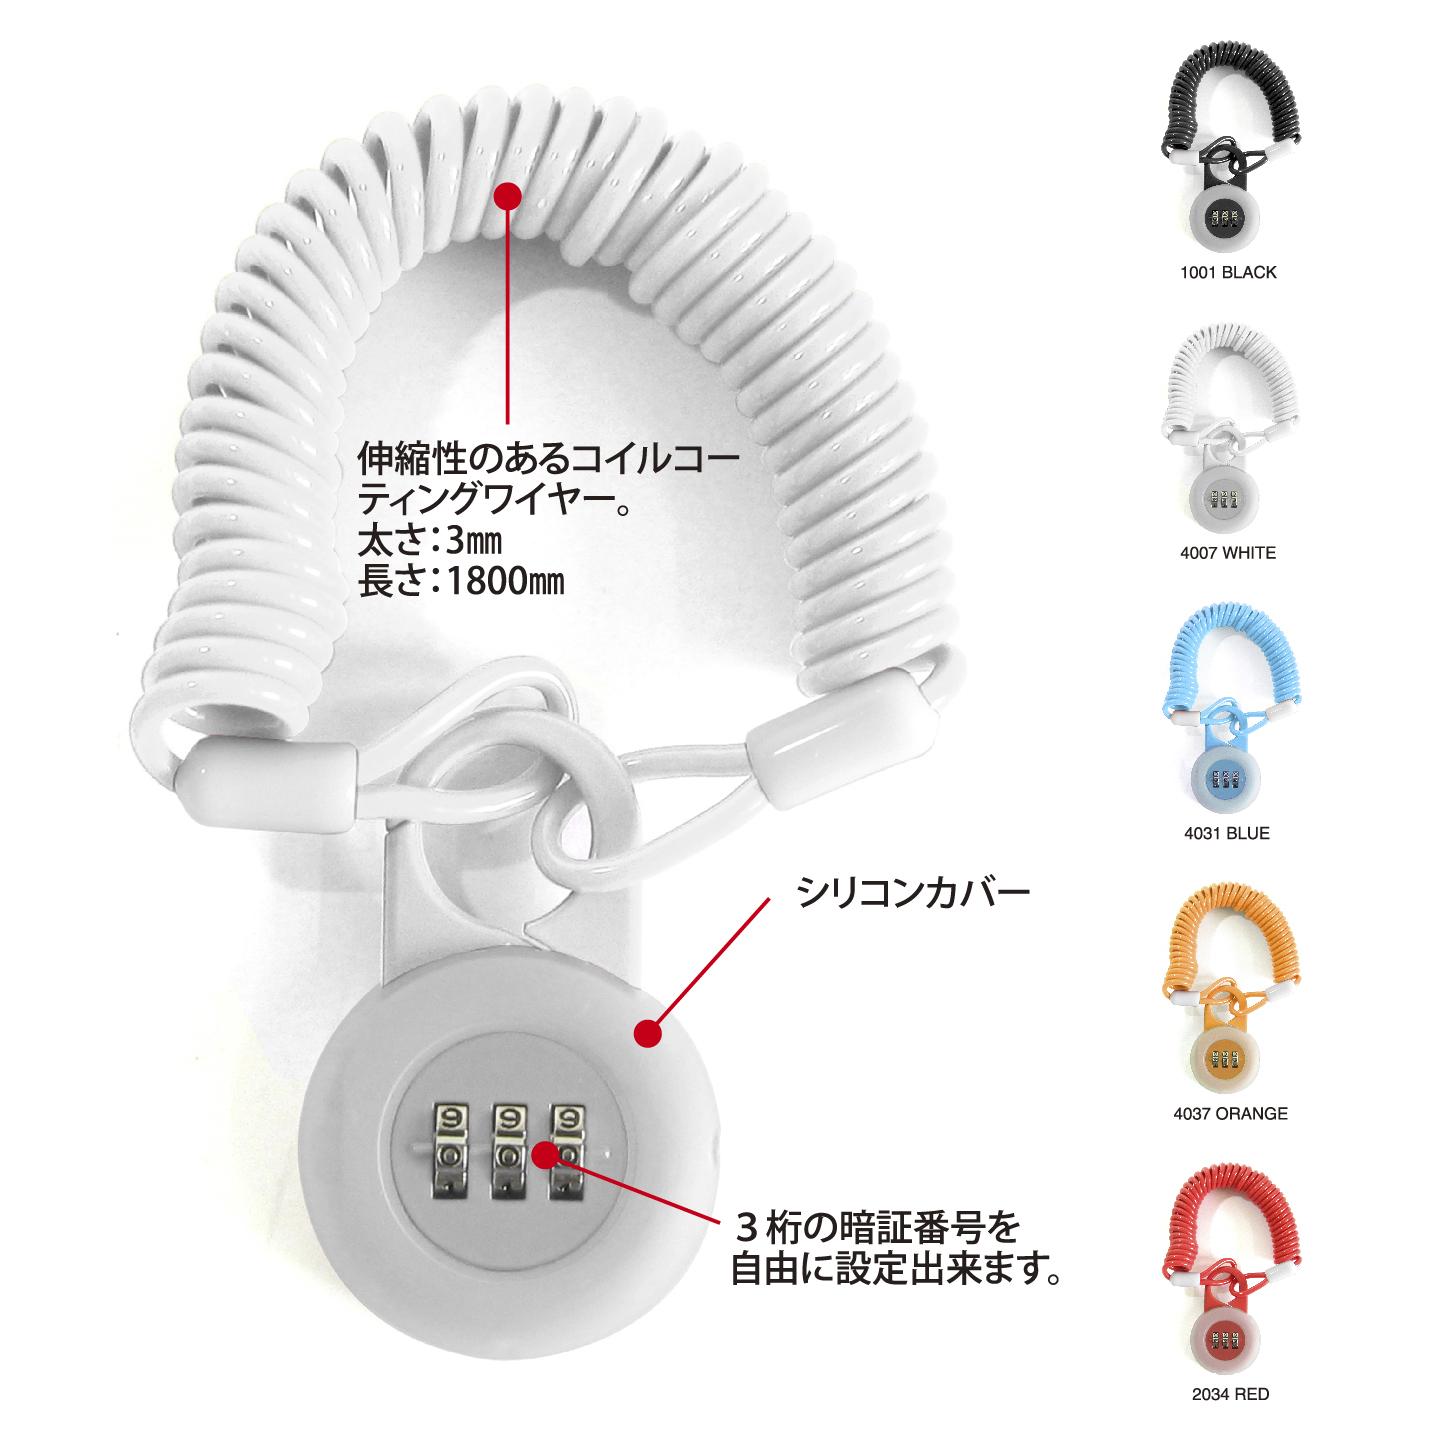 #150501 Dial Lock / 全5色